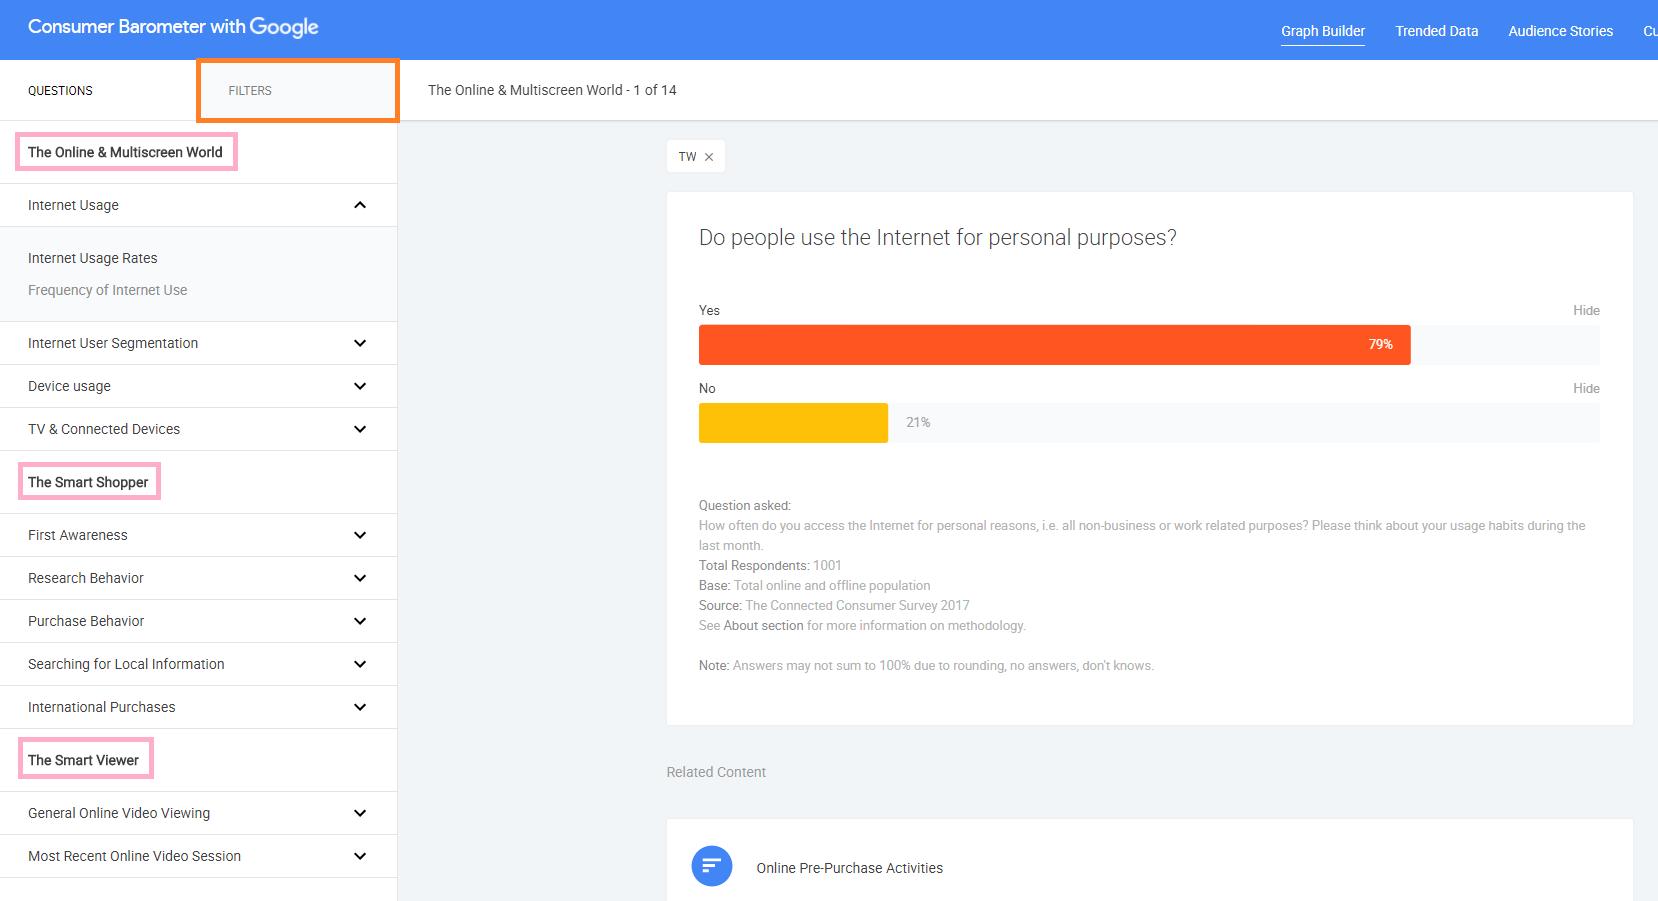 consumer2 - 透過 Google Consumer Barometer 問卷調查結果瞭解用戶如何使用網路